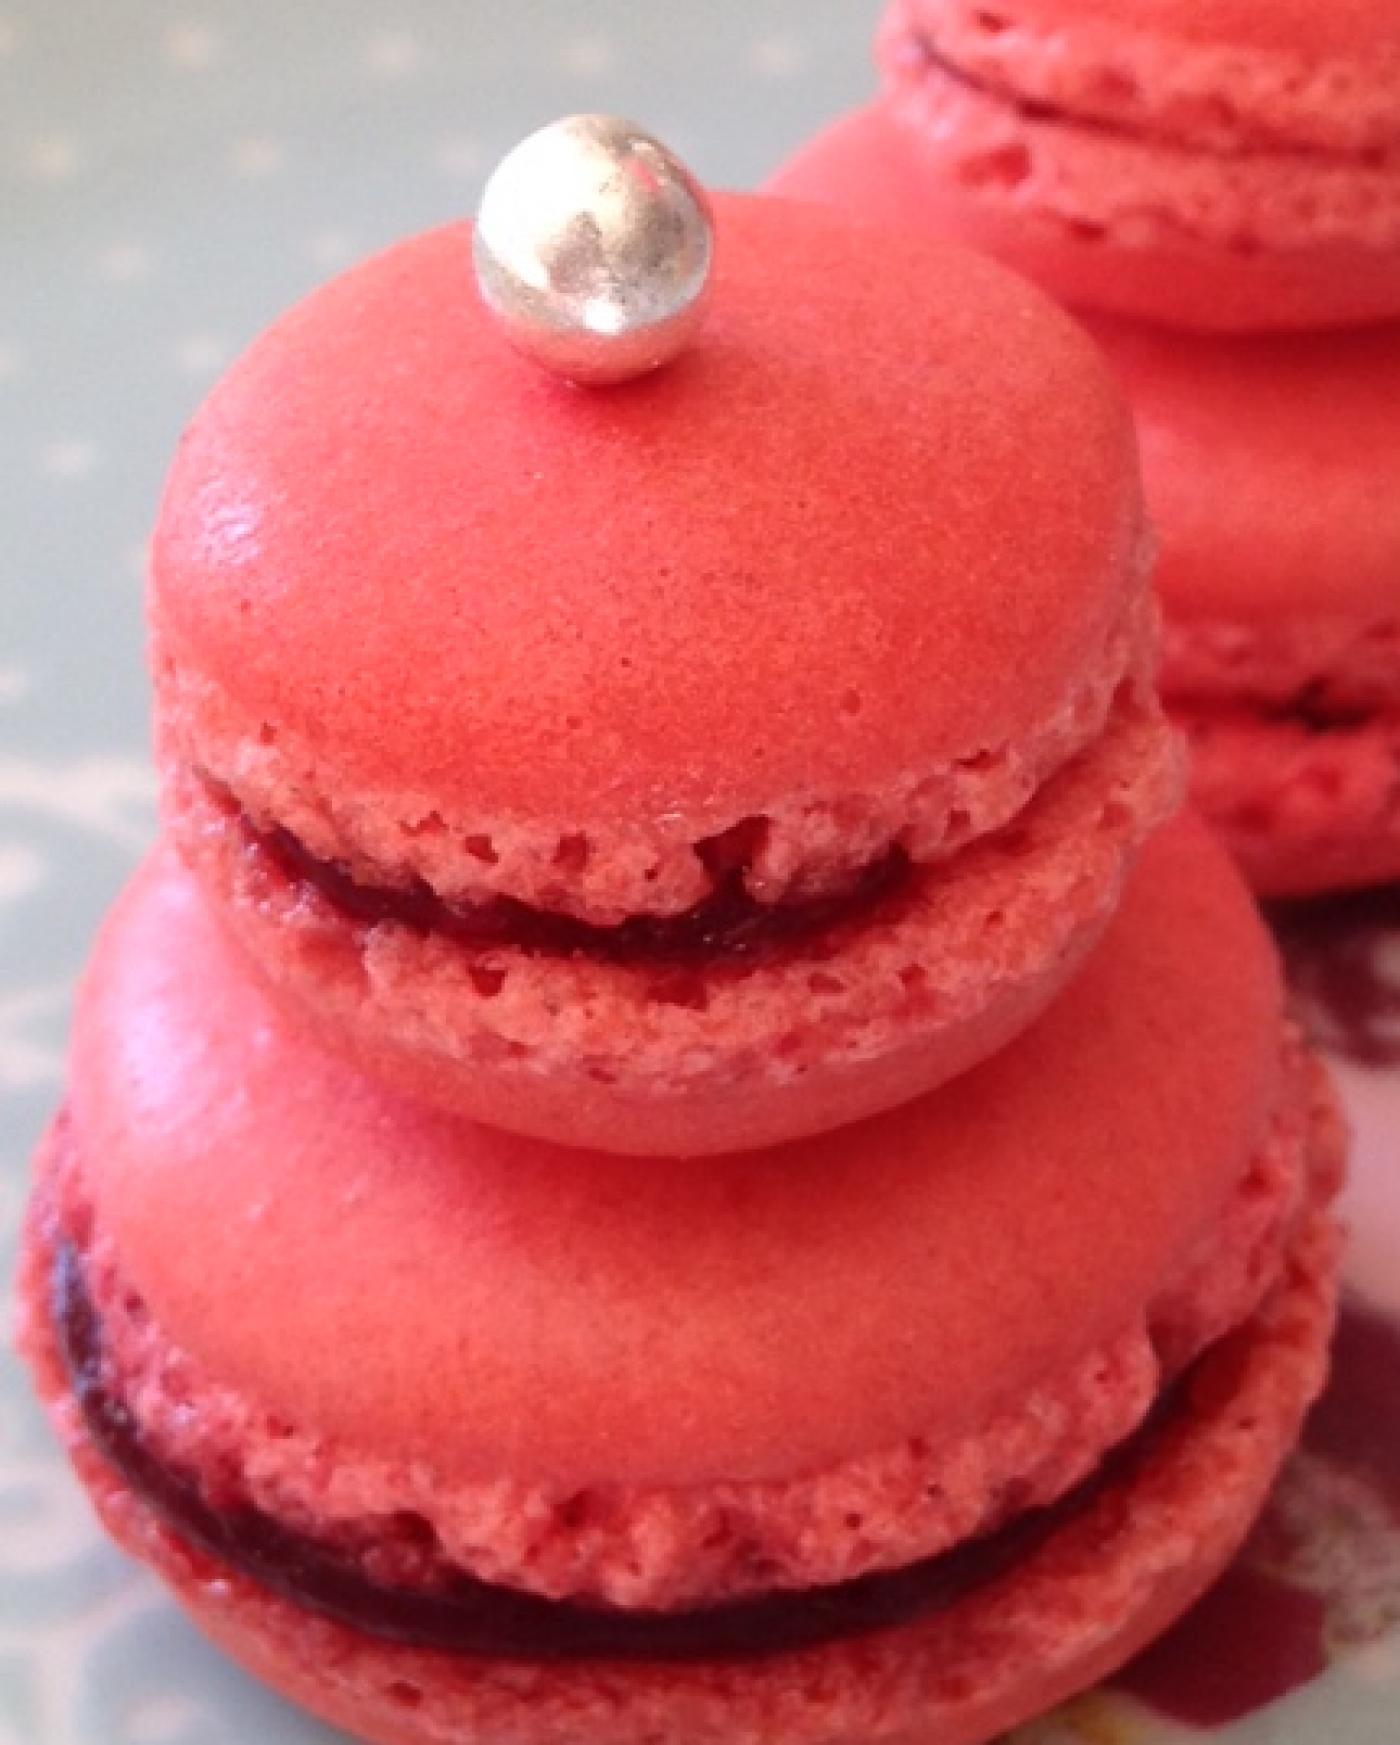 Macaron religieuse rose framboise